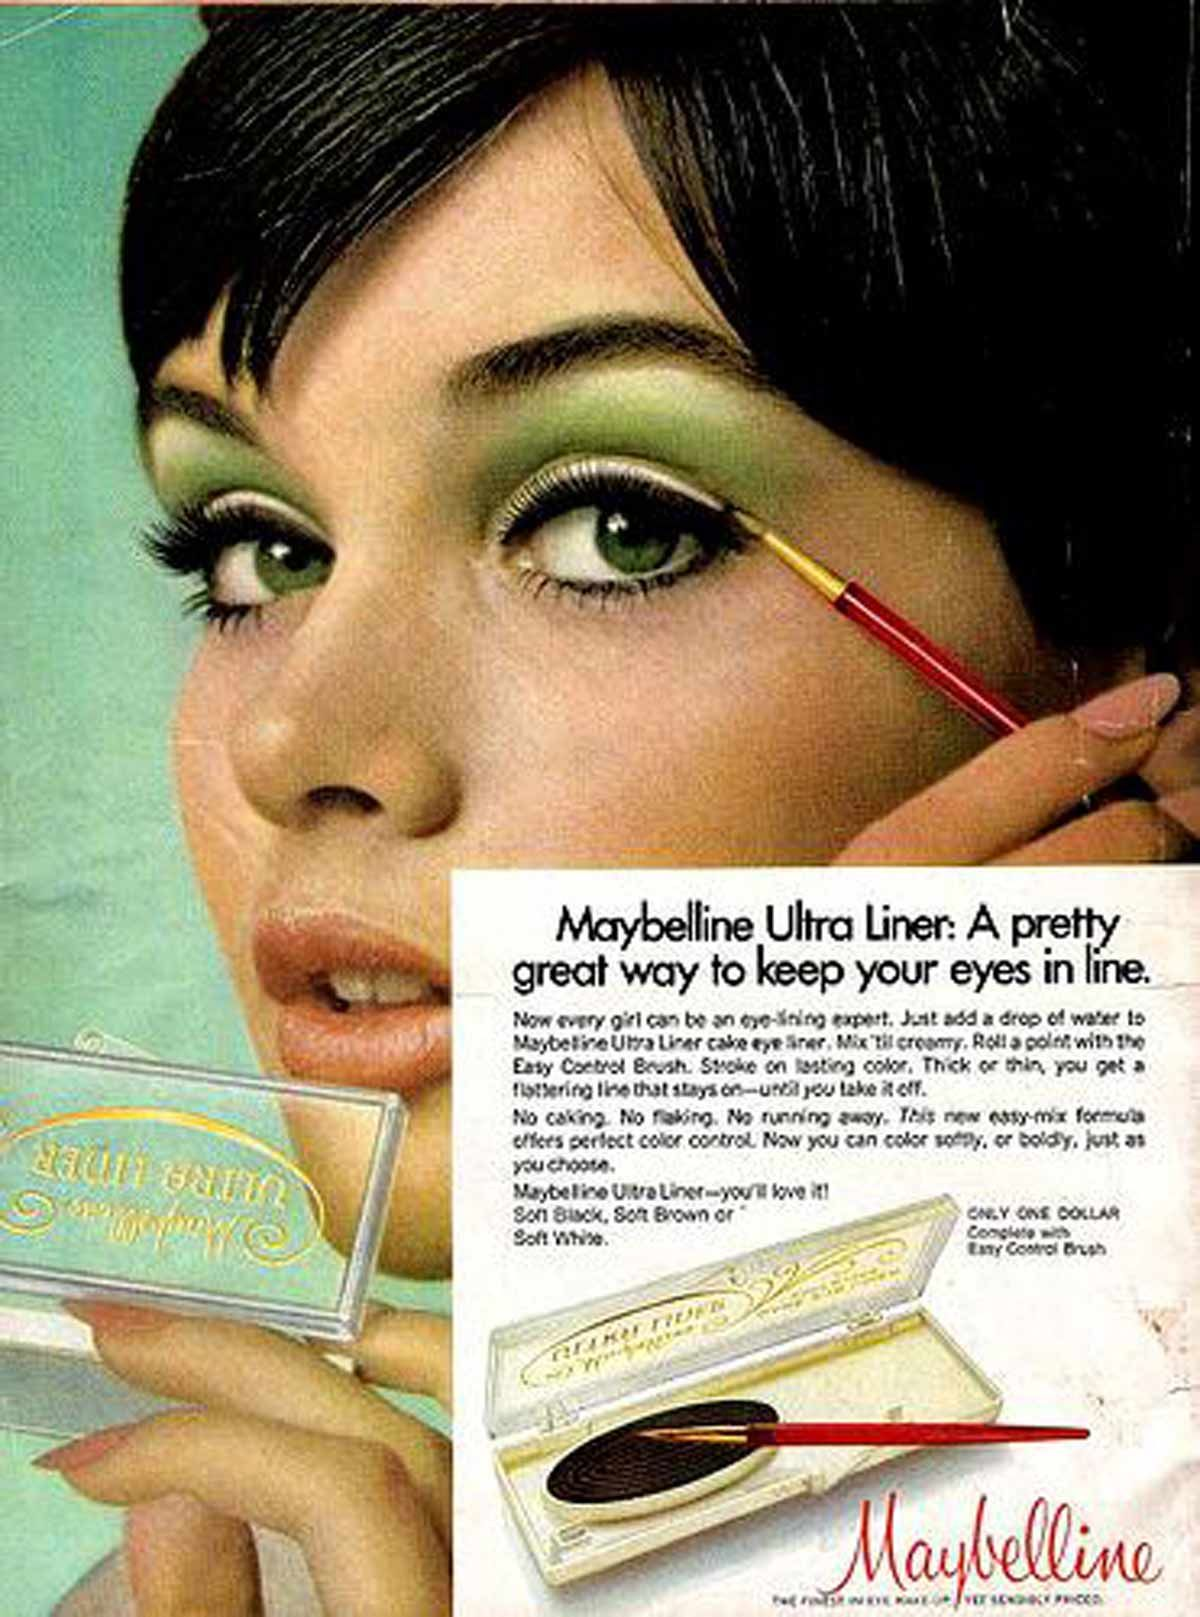 The 1970s Makeup Look 5 Key Points Vintage Makeup Ads 70s